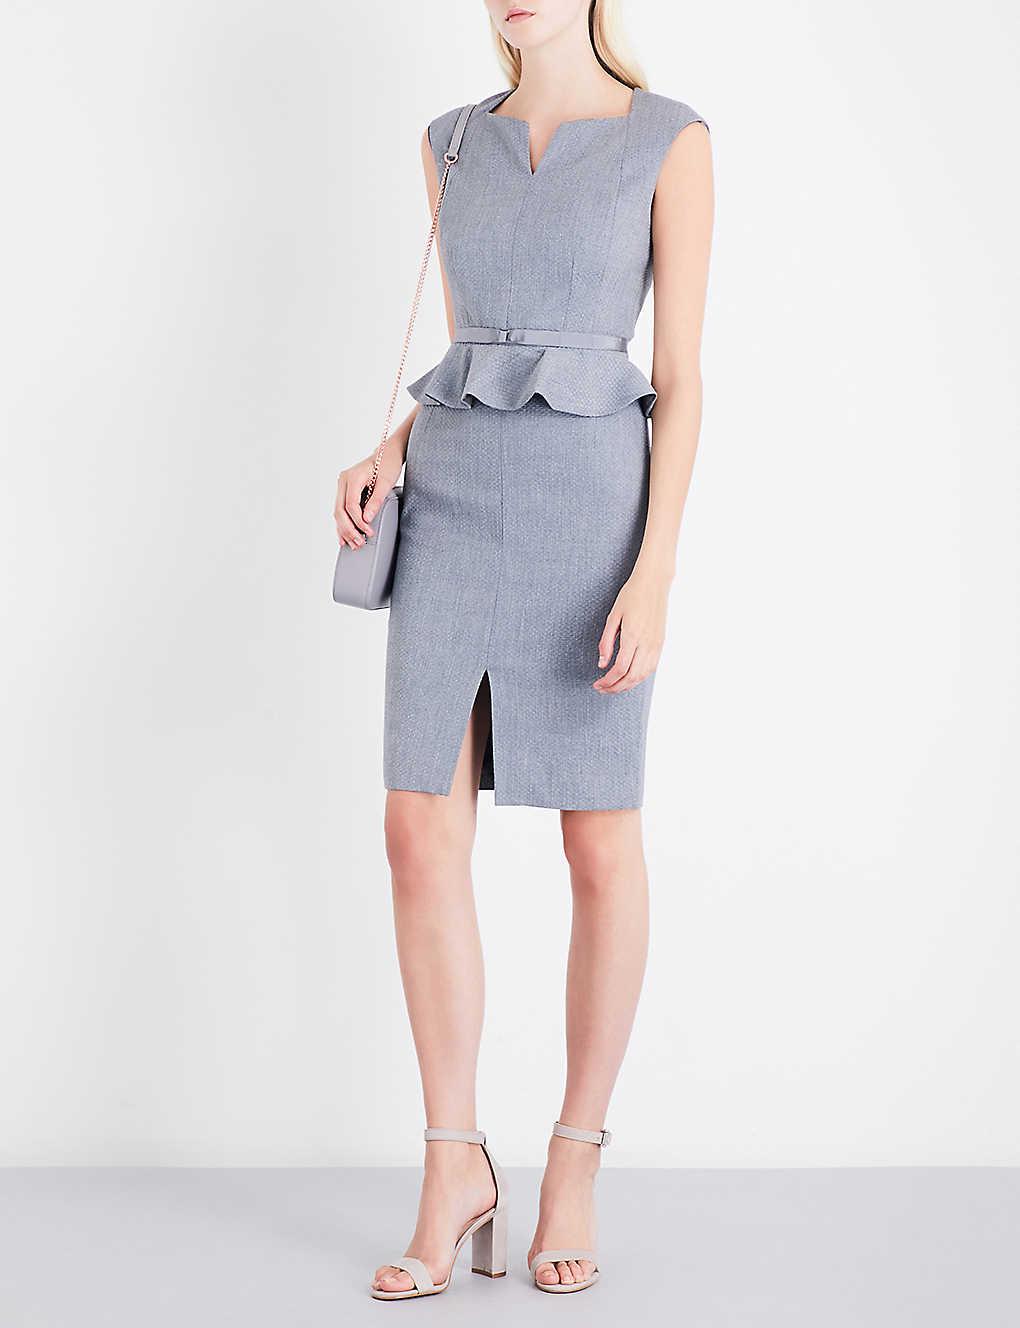 Ted Baker Nadaed Peplum Textured Jacquard Dress Selfridges